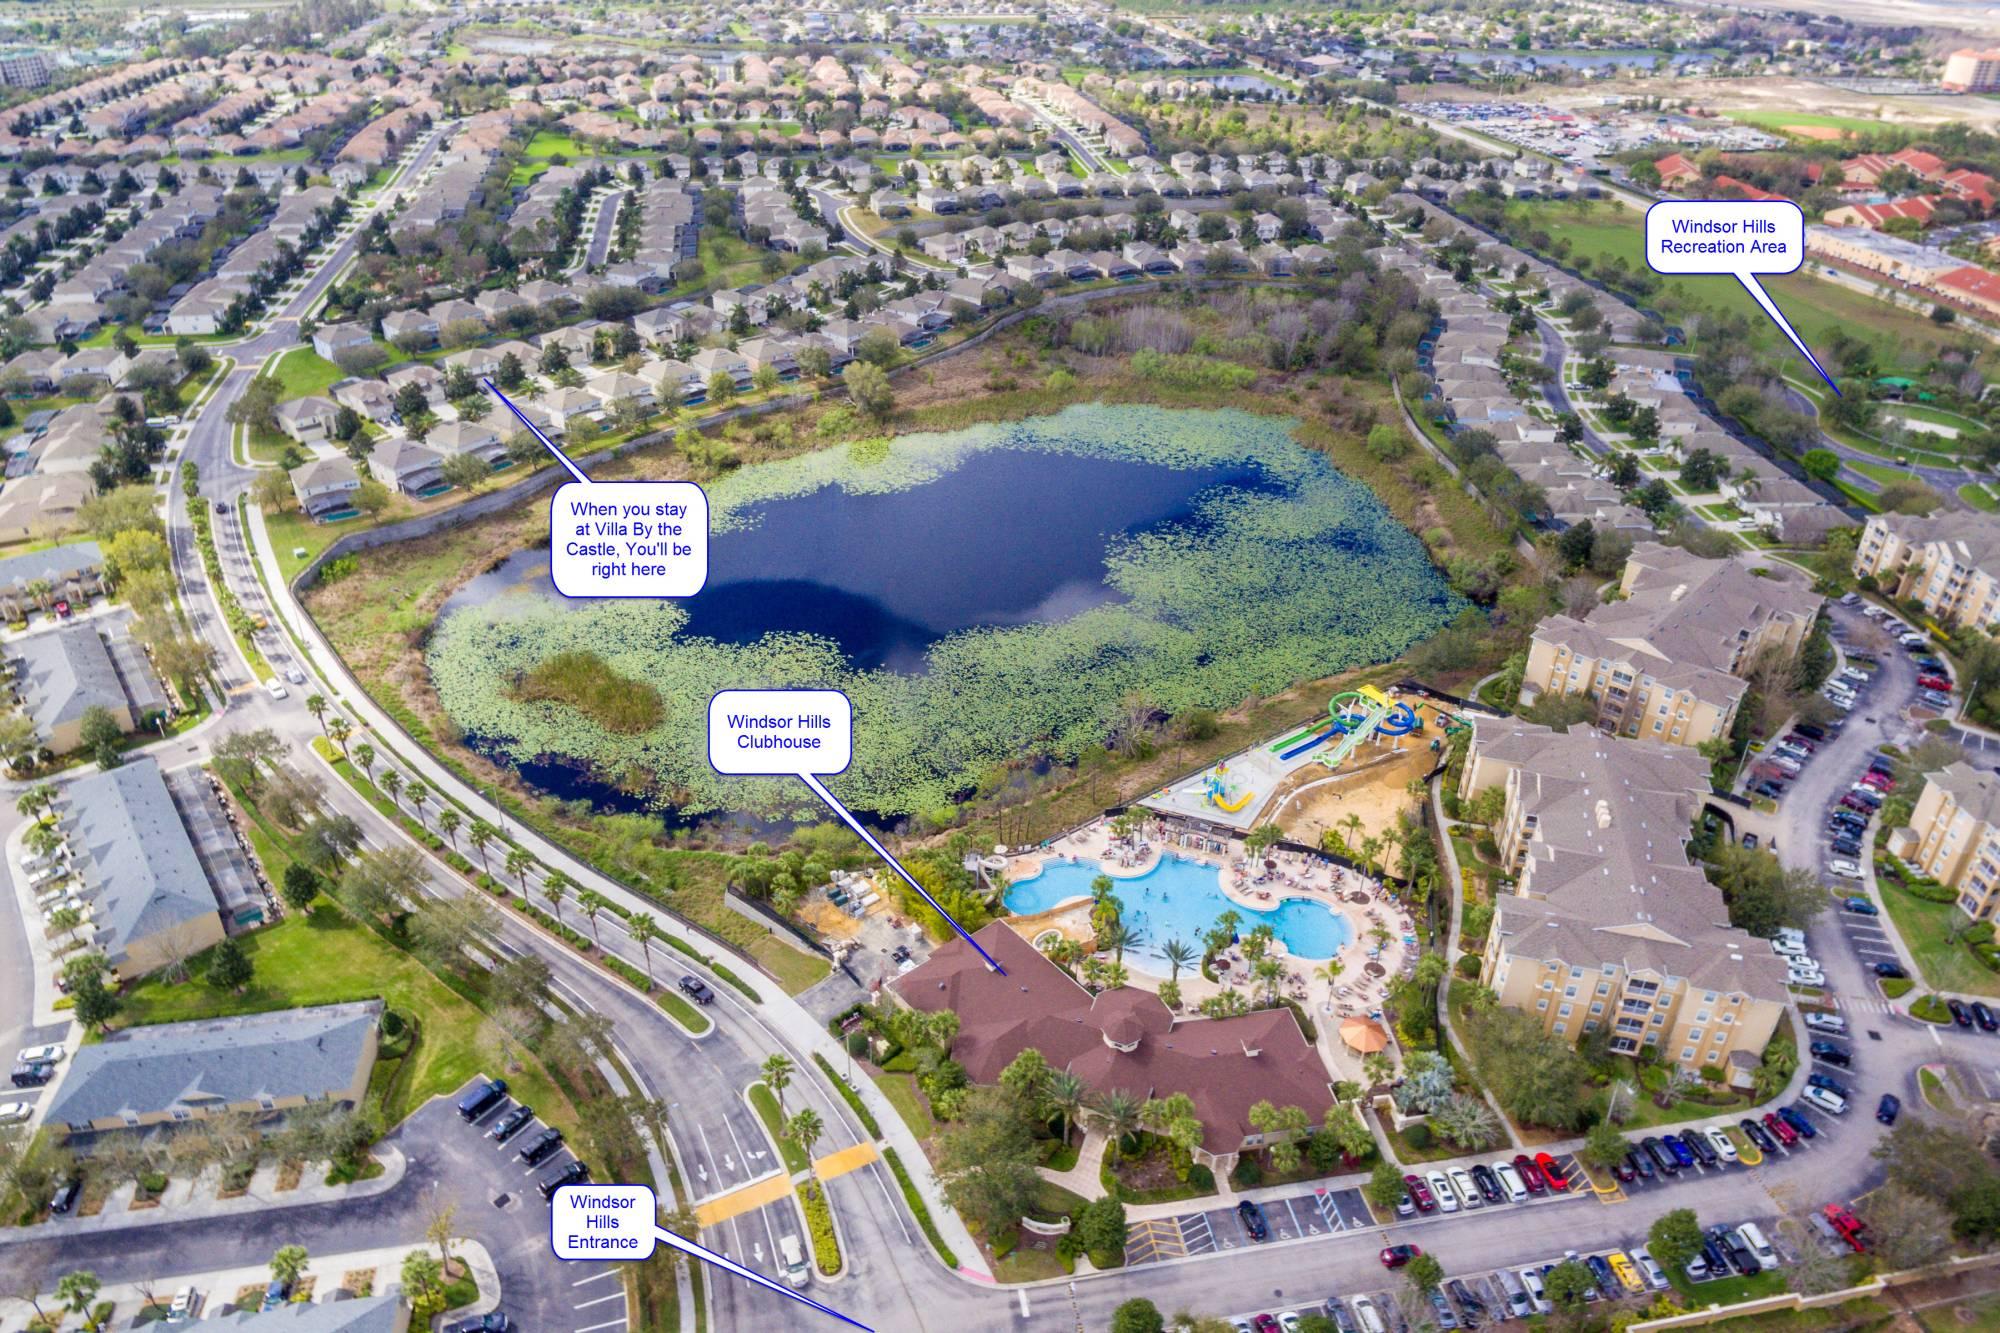 Windsor Hills Resort Arial View